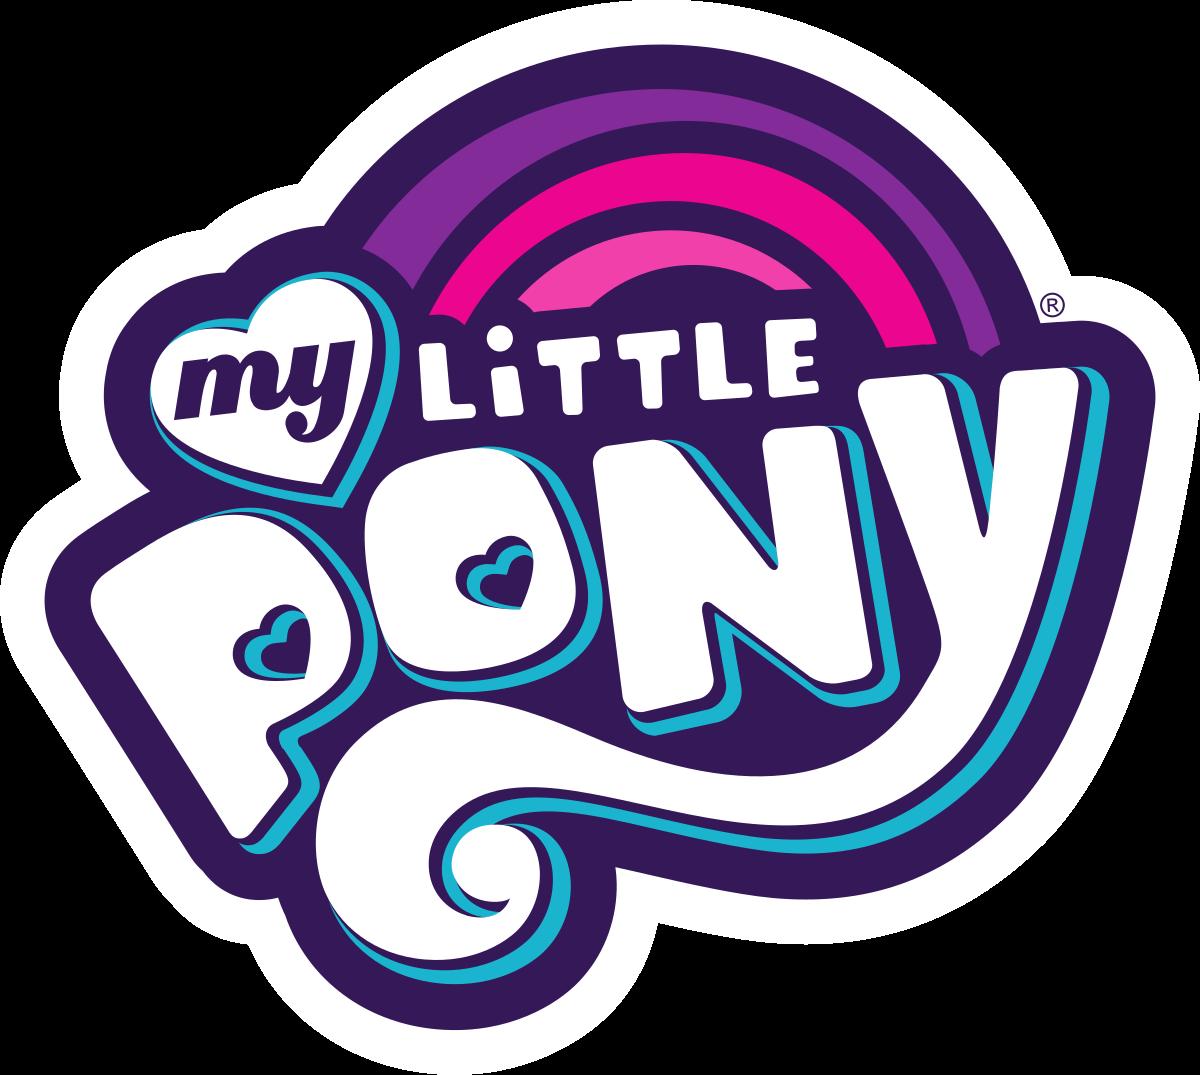 My Little Pony G4 logo svg